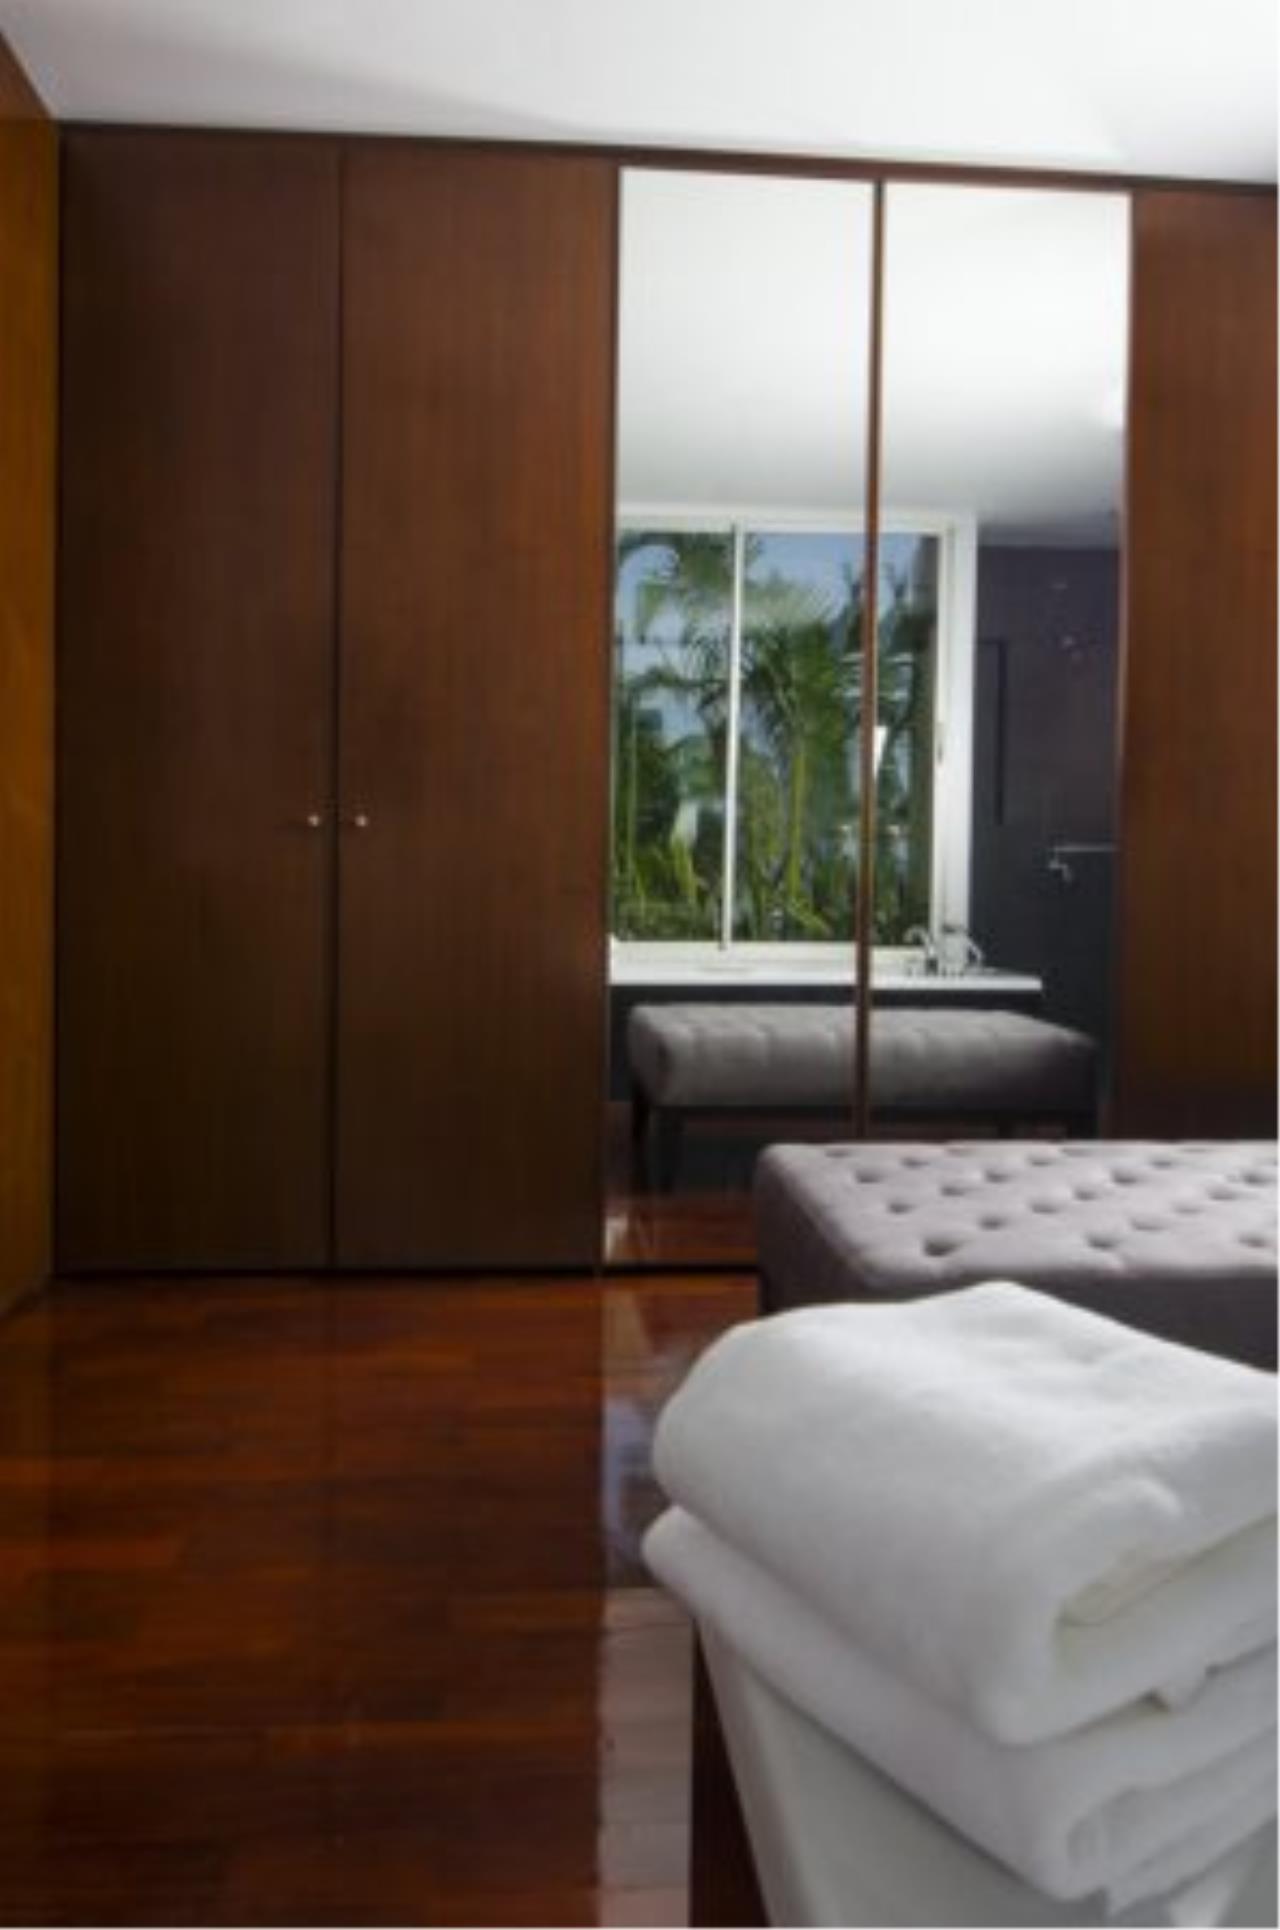 BKK Condos Agency's Fabulous 4 bedroom apartments for rental, 1 unit per floor, at Panburi, Silom 11